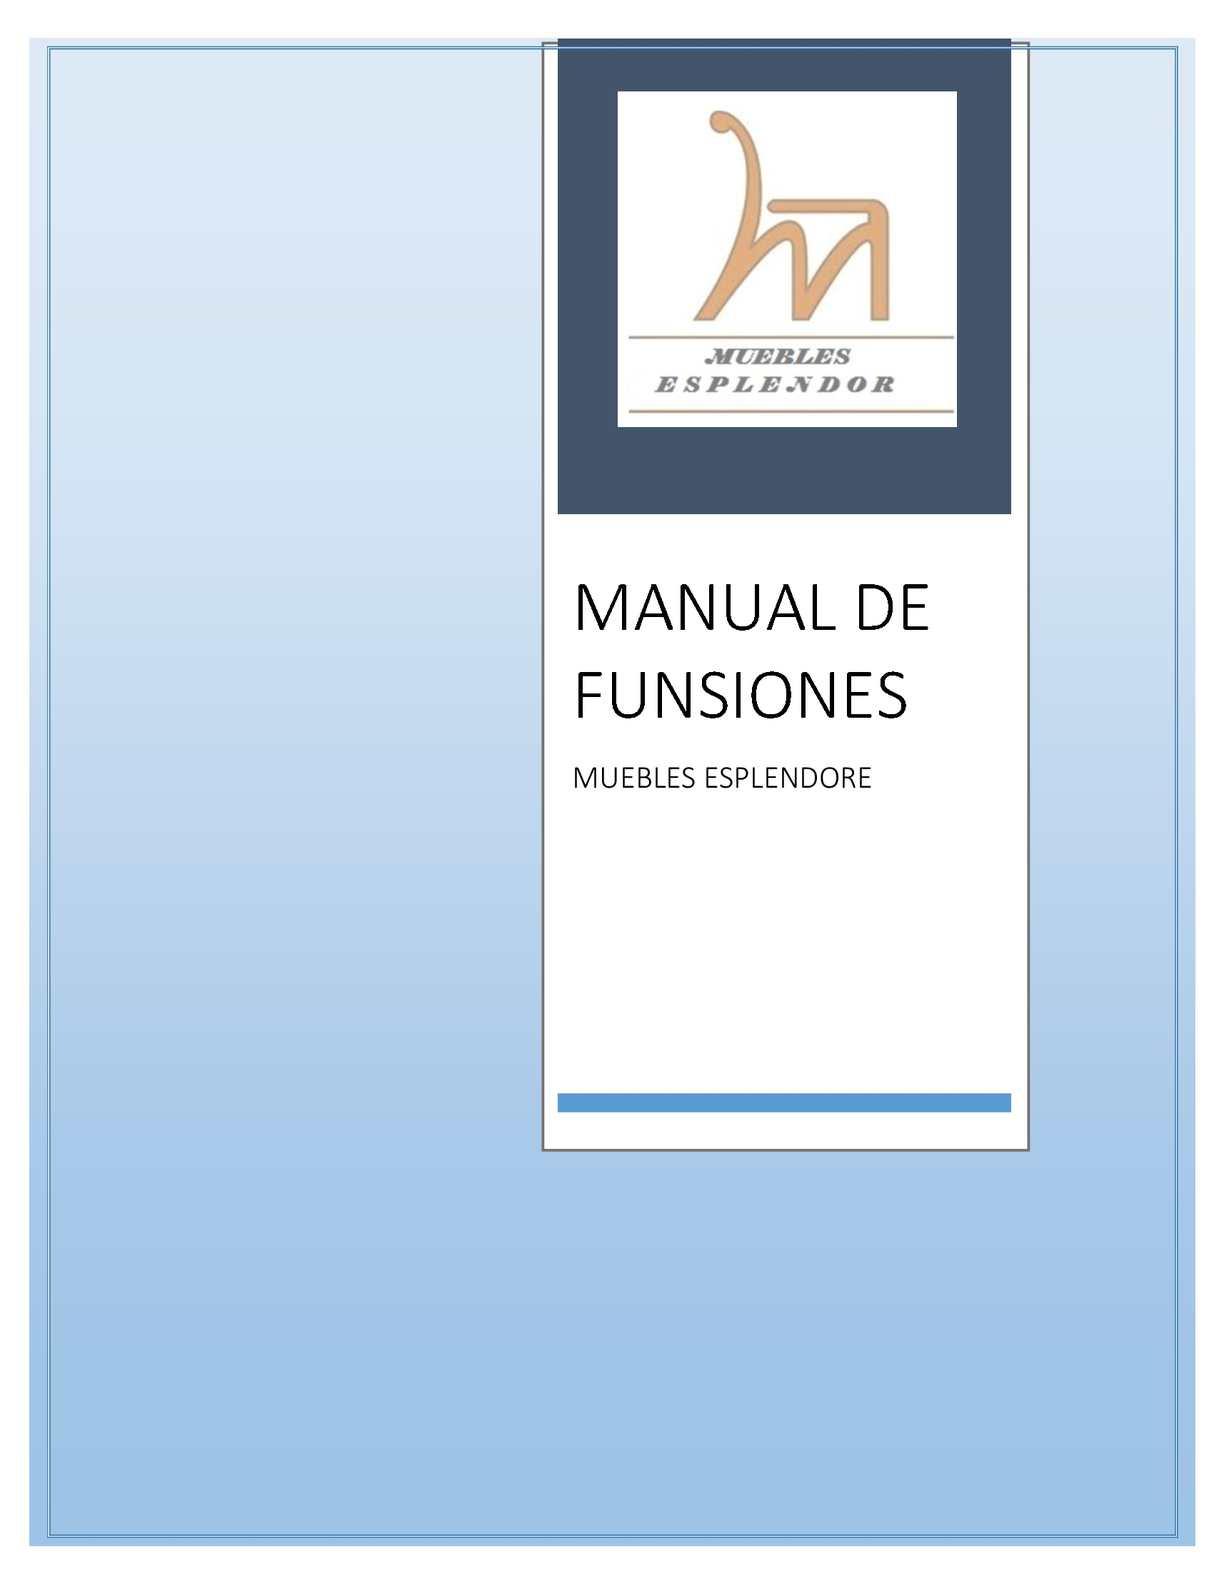 MANUAL DE FUNCIONES MUEBLES ESPLENDOR